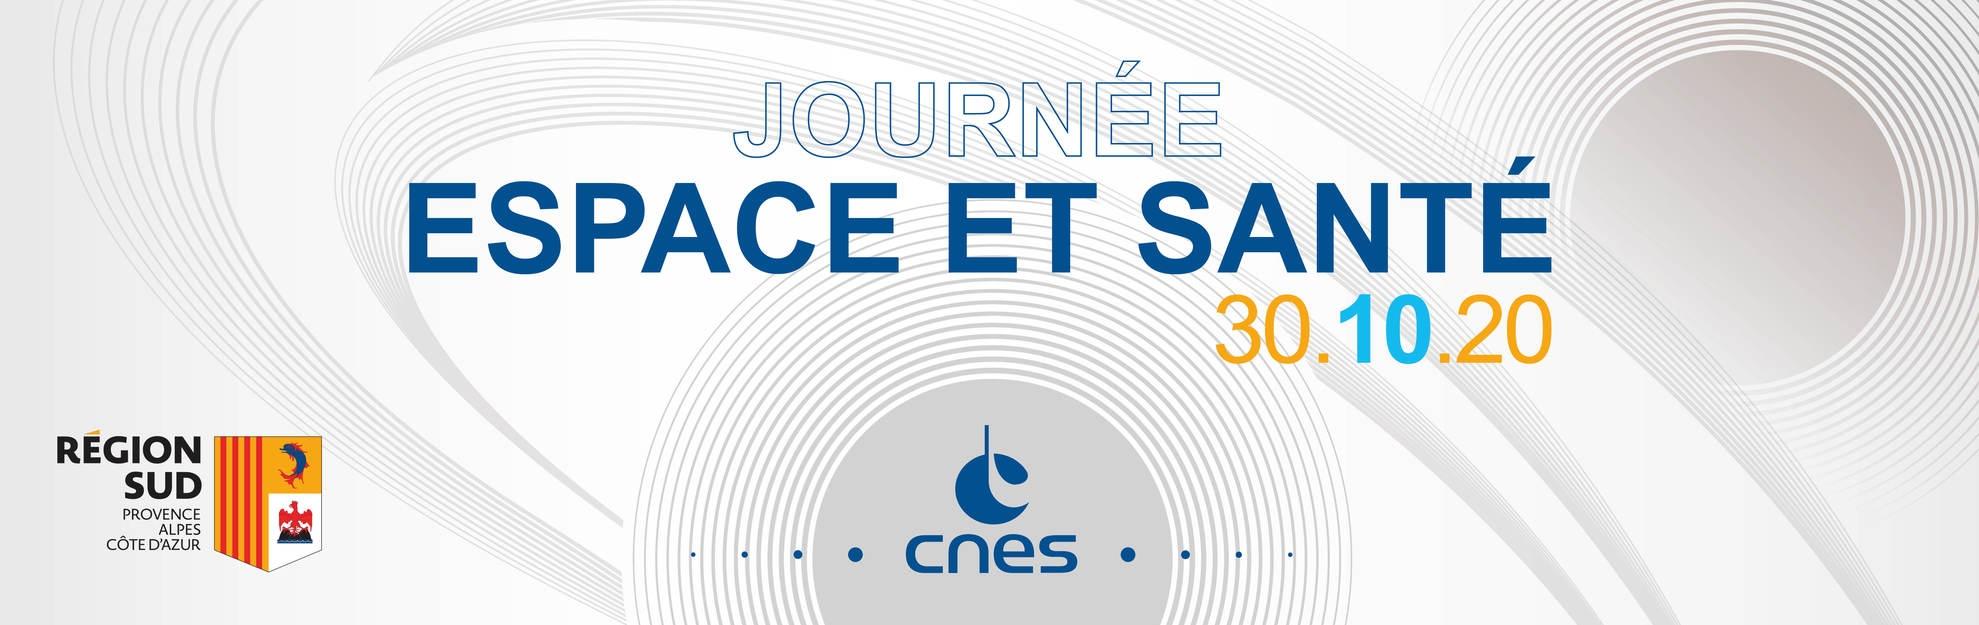 ep_banner_espace_et_sante_2020.jpg